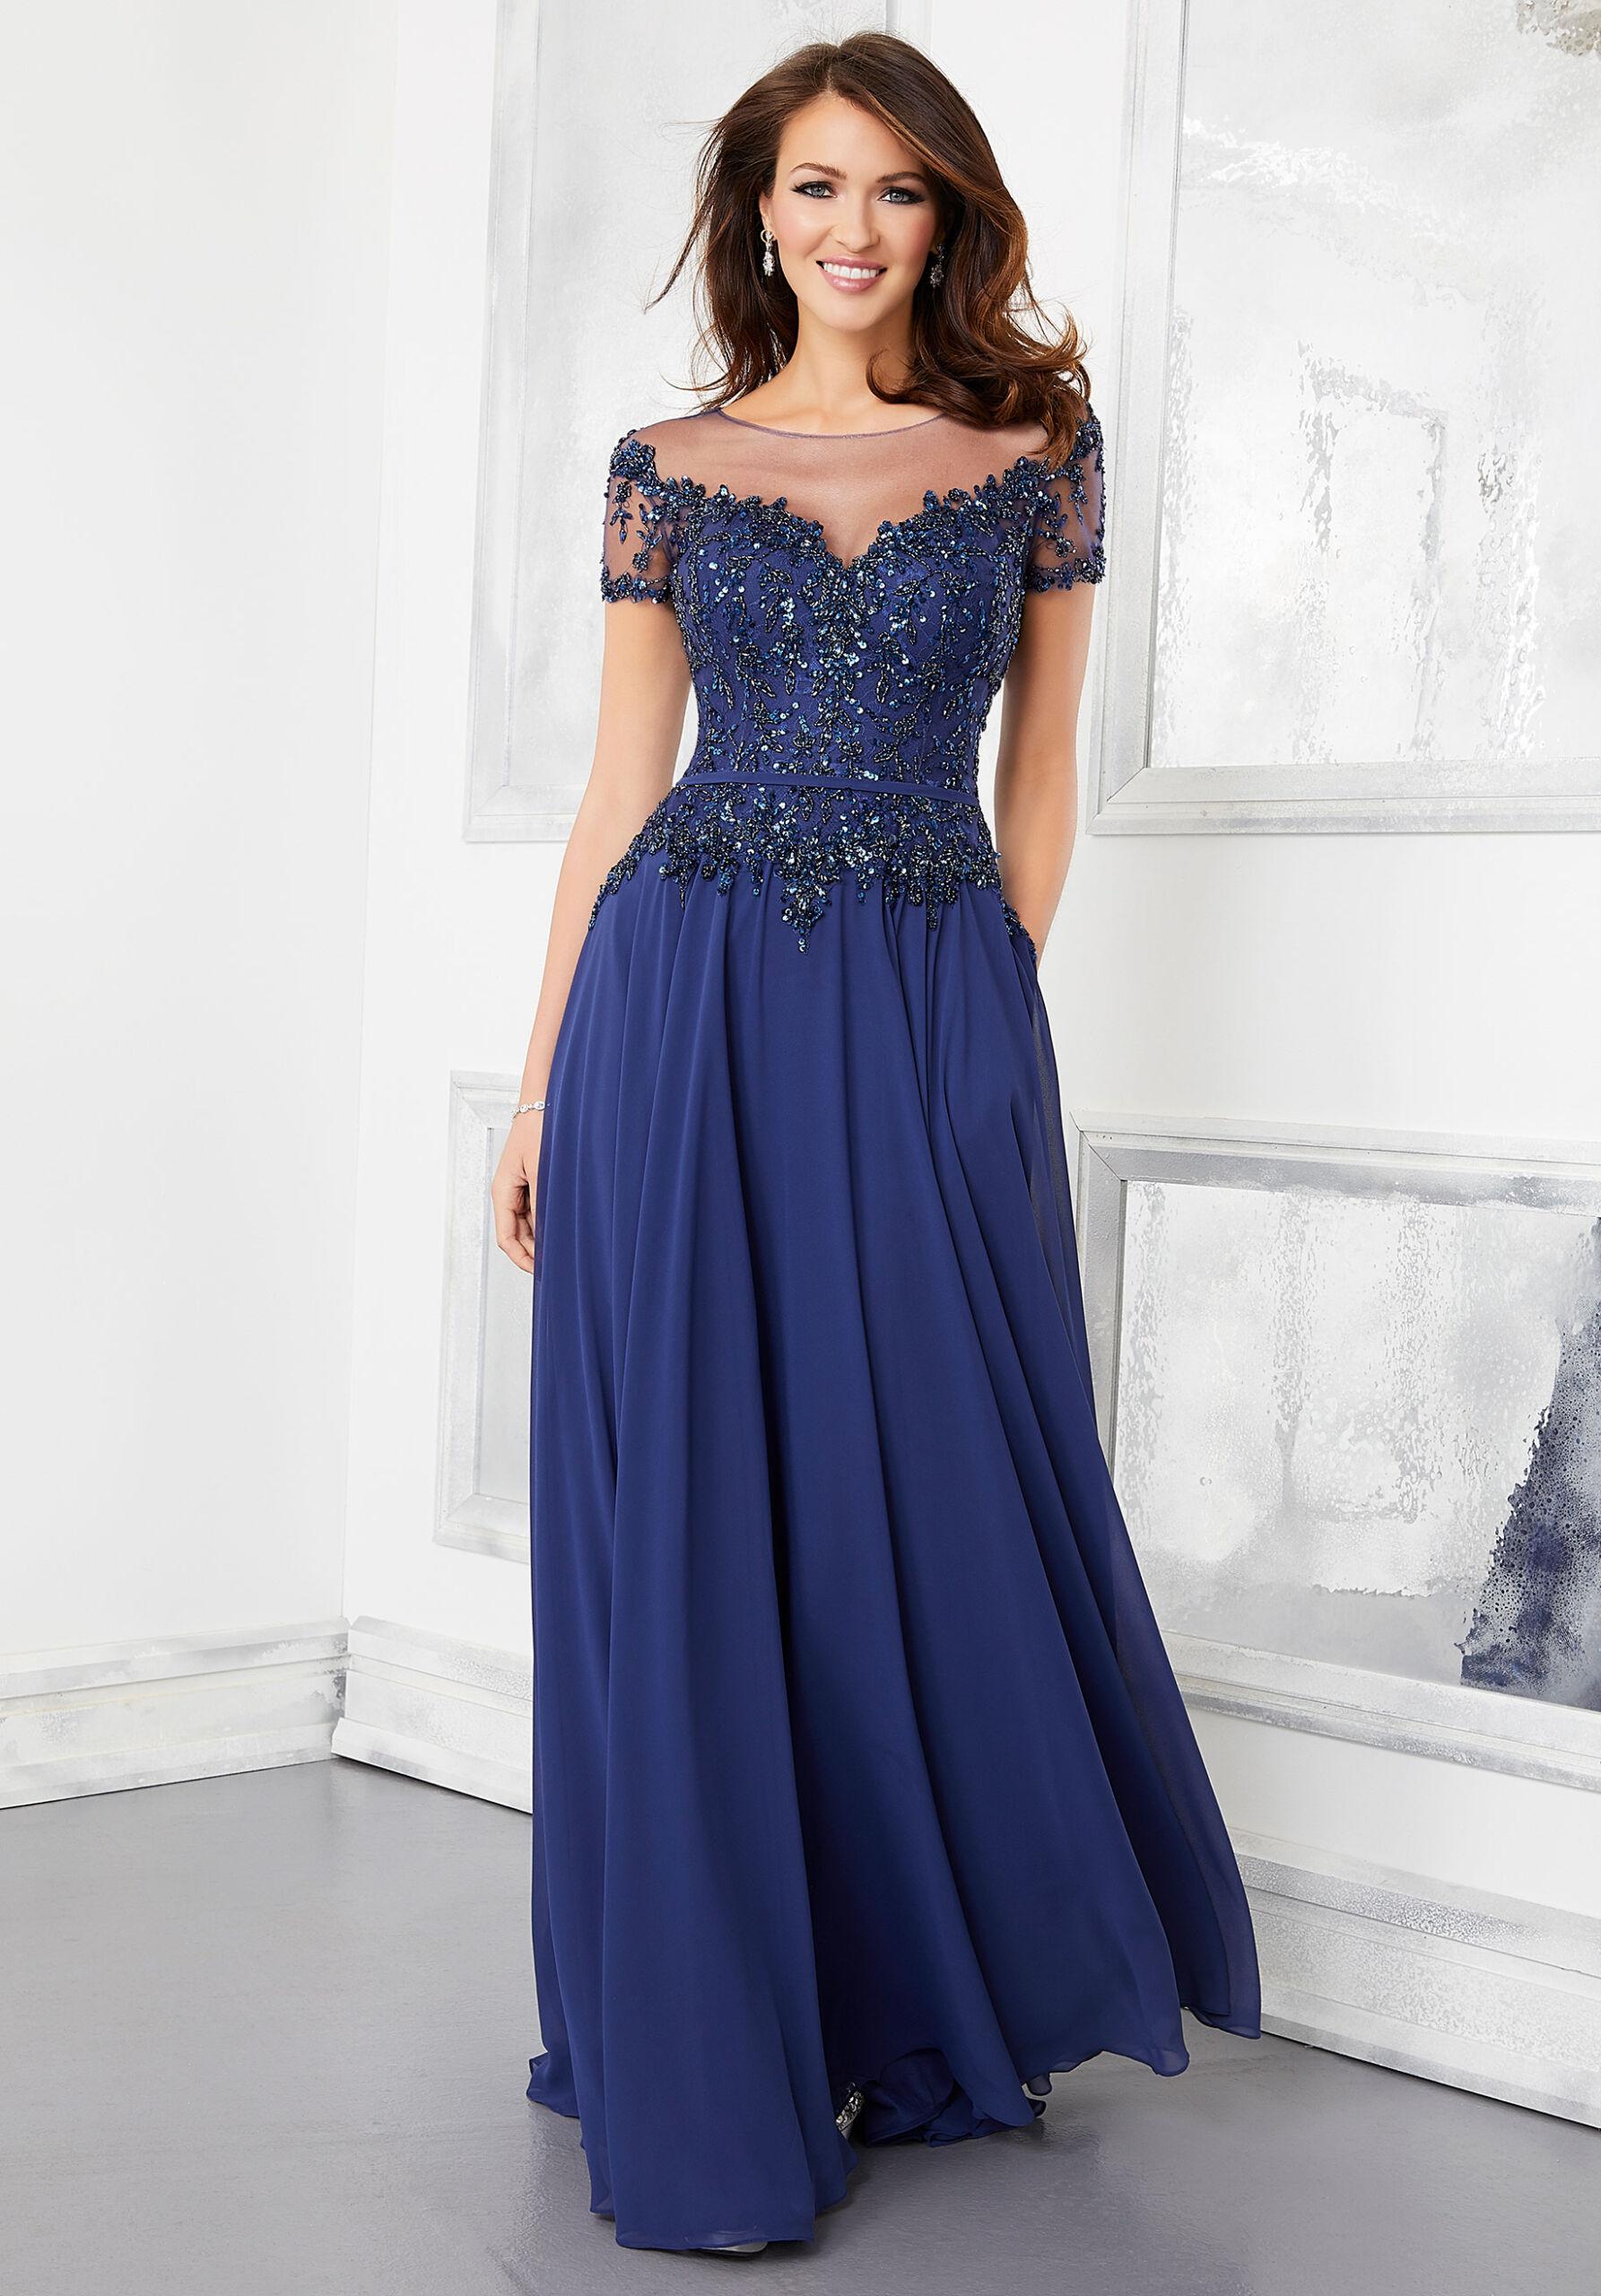 whats the evening wear dress code for women herstylecode What's the Evening Wear Code for Women?